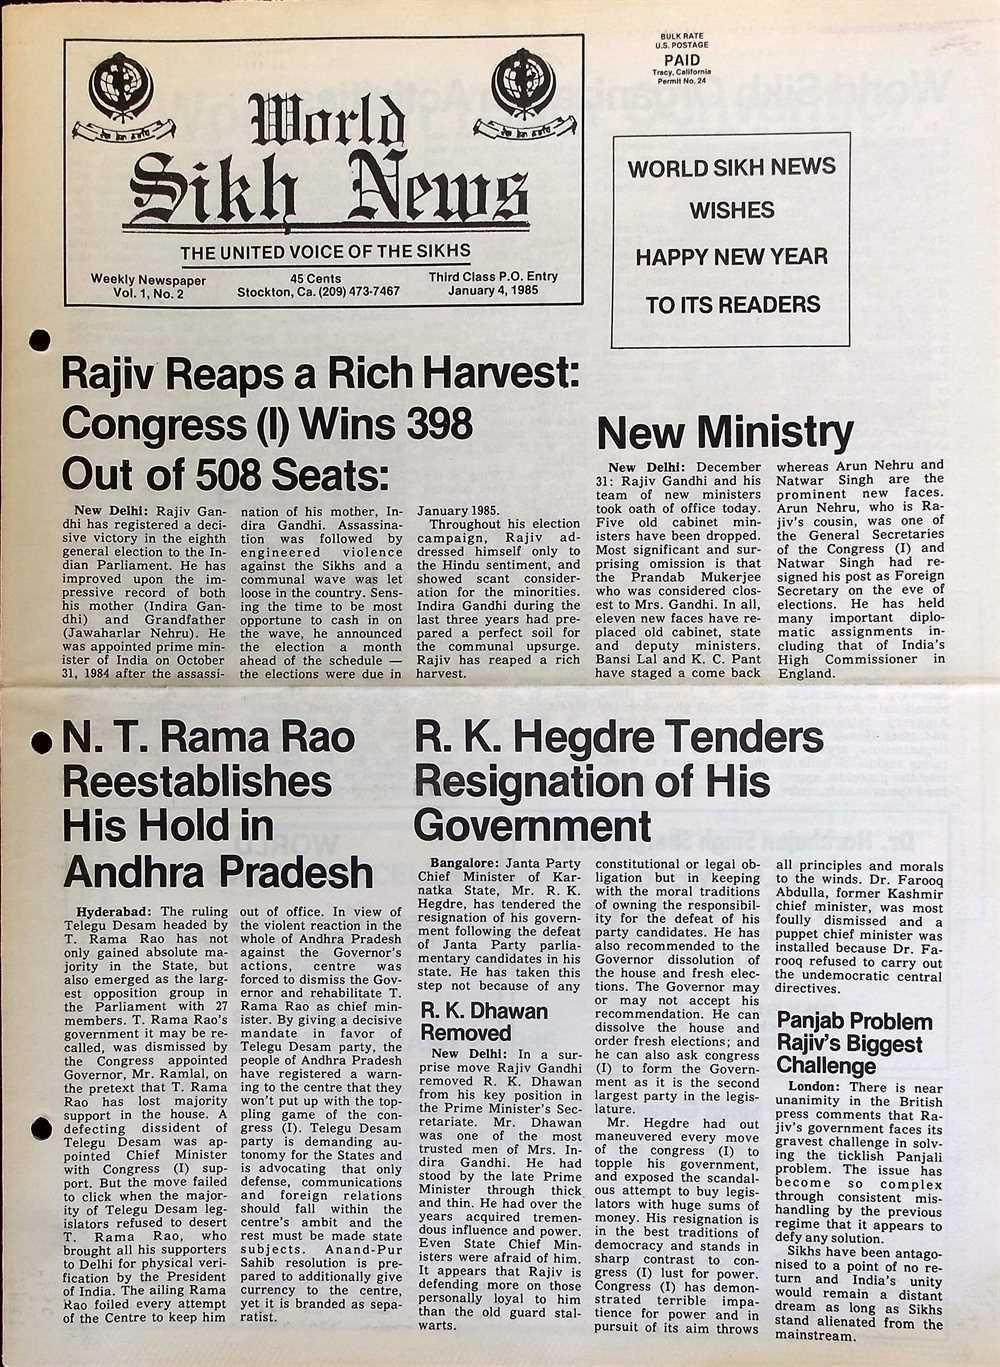 JANUARY 4, 1985